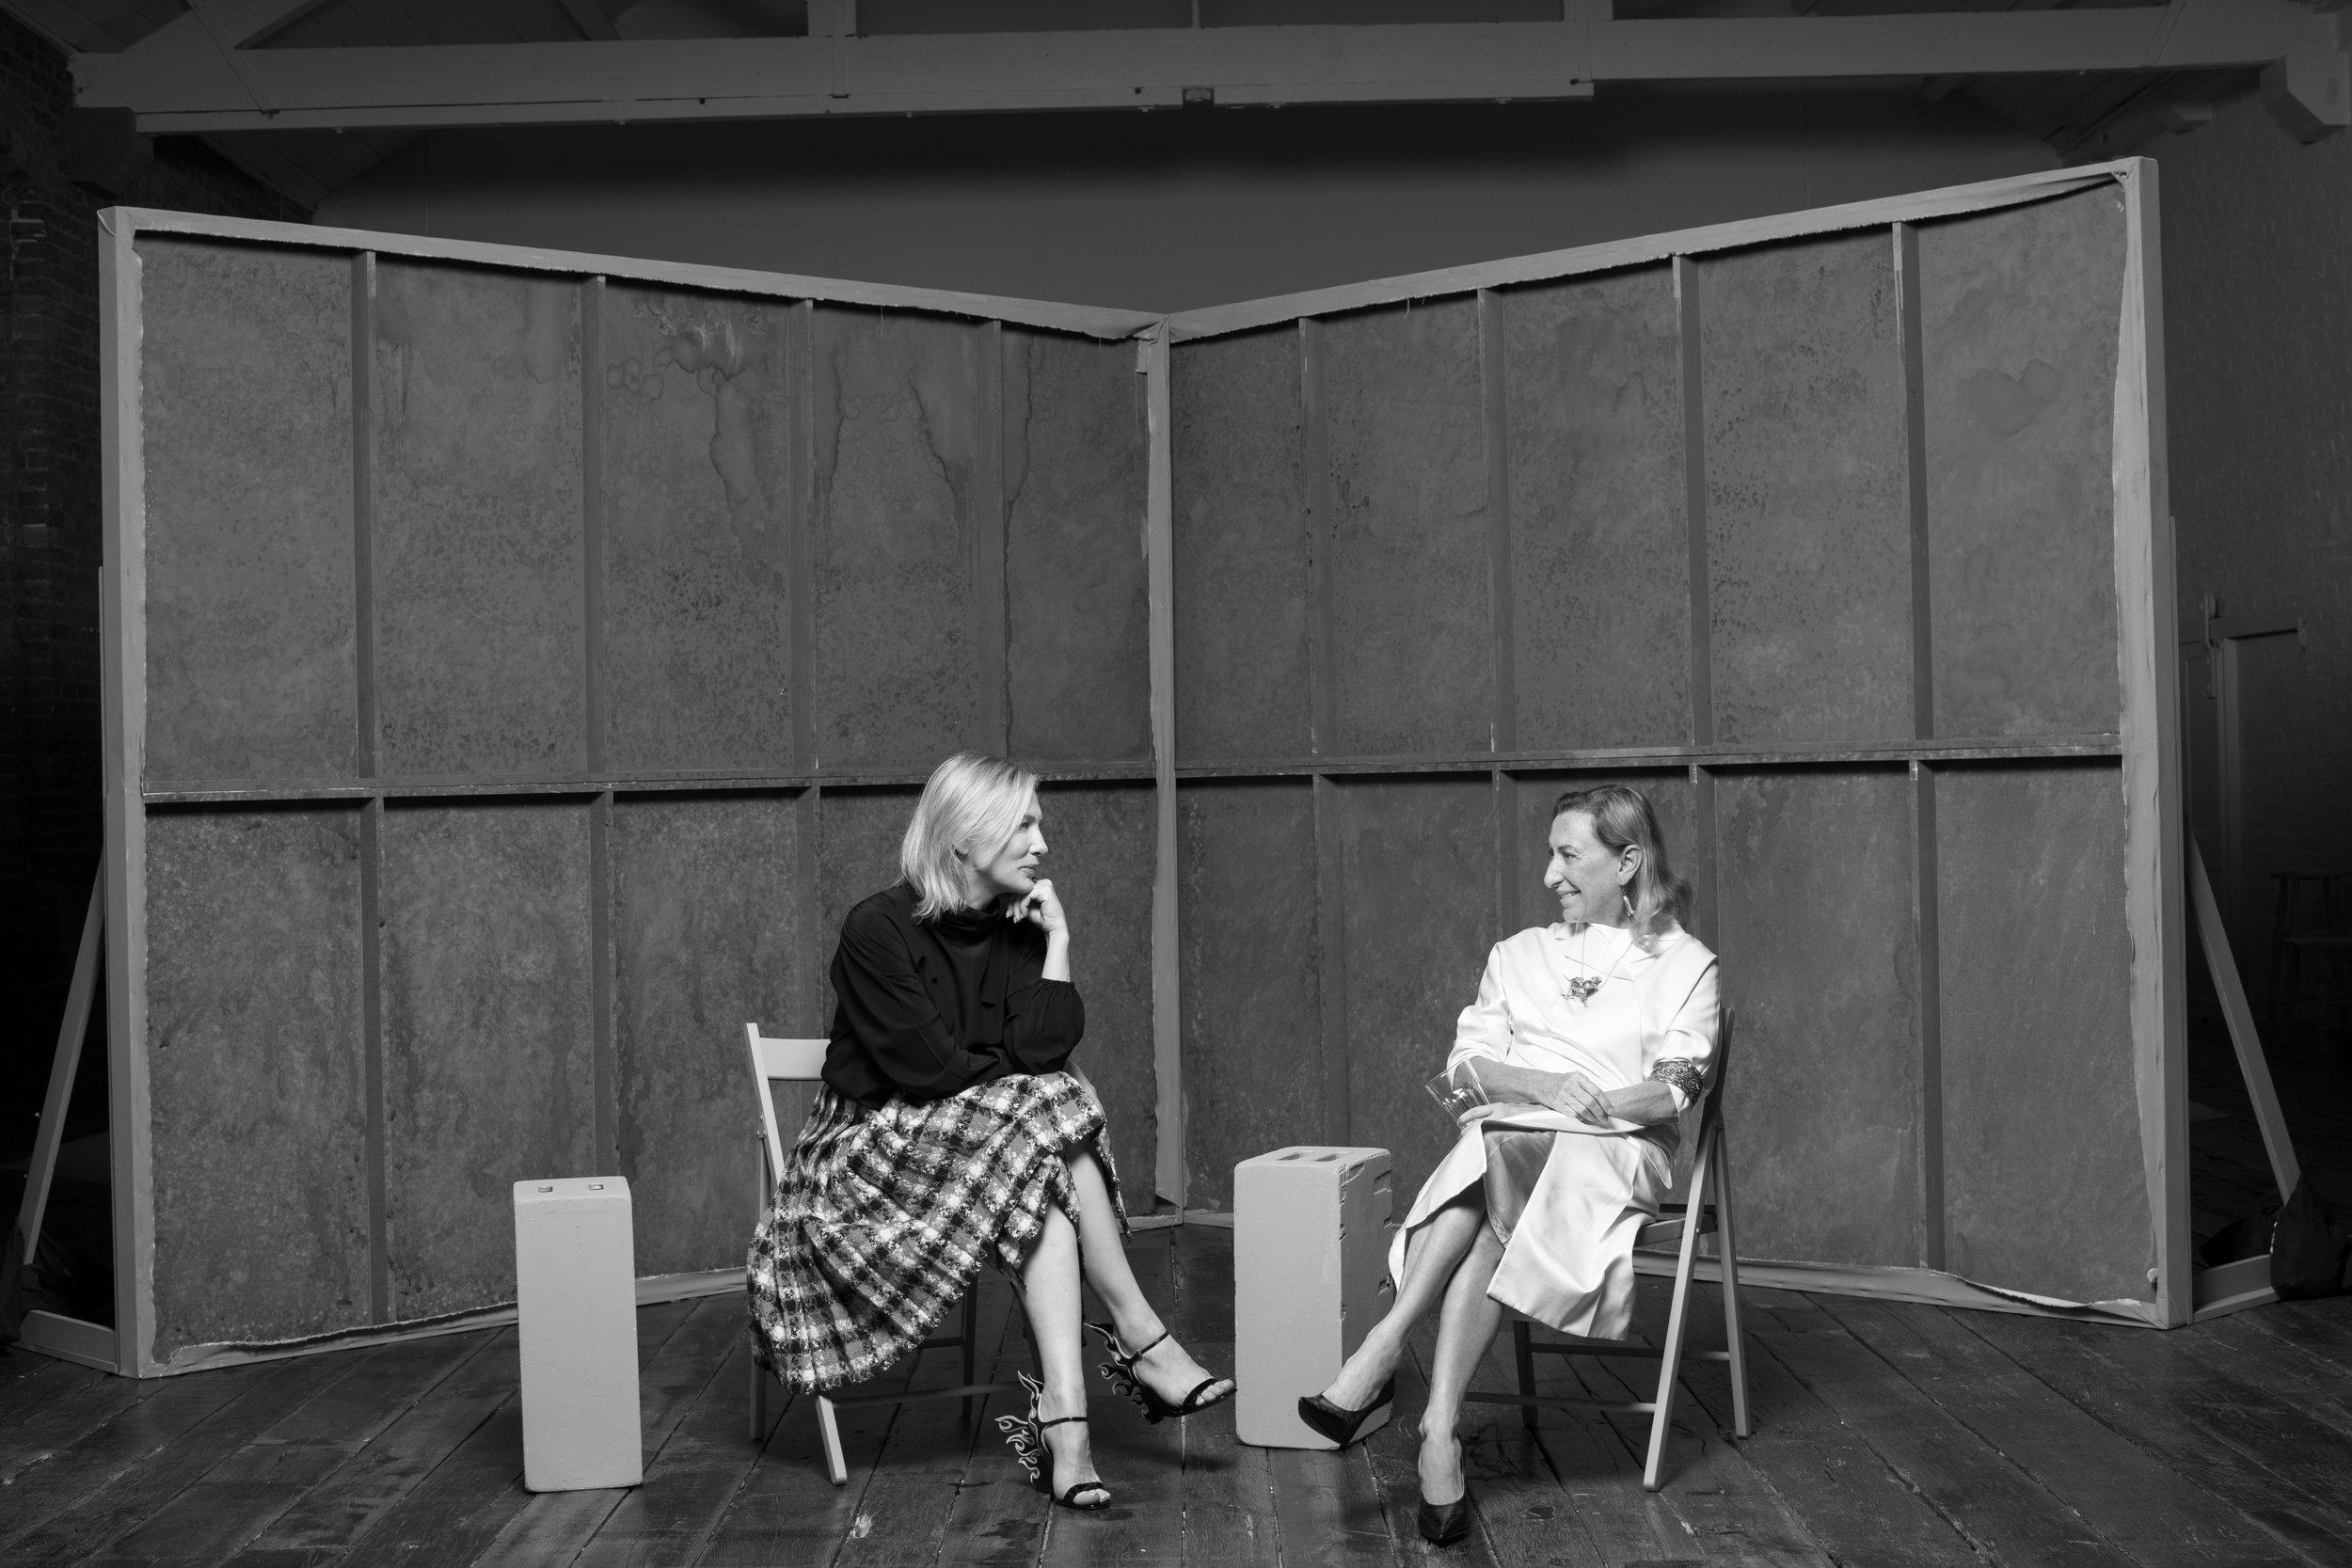 Cate Blanchett and Miuccia Prada, London